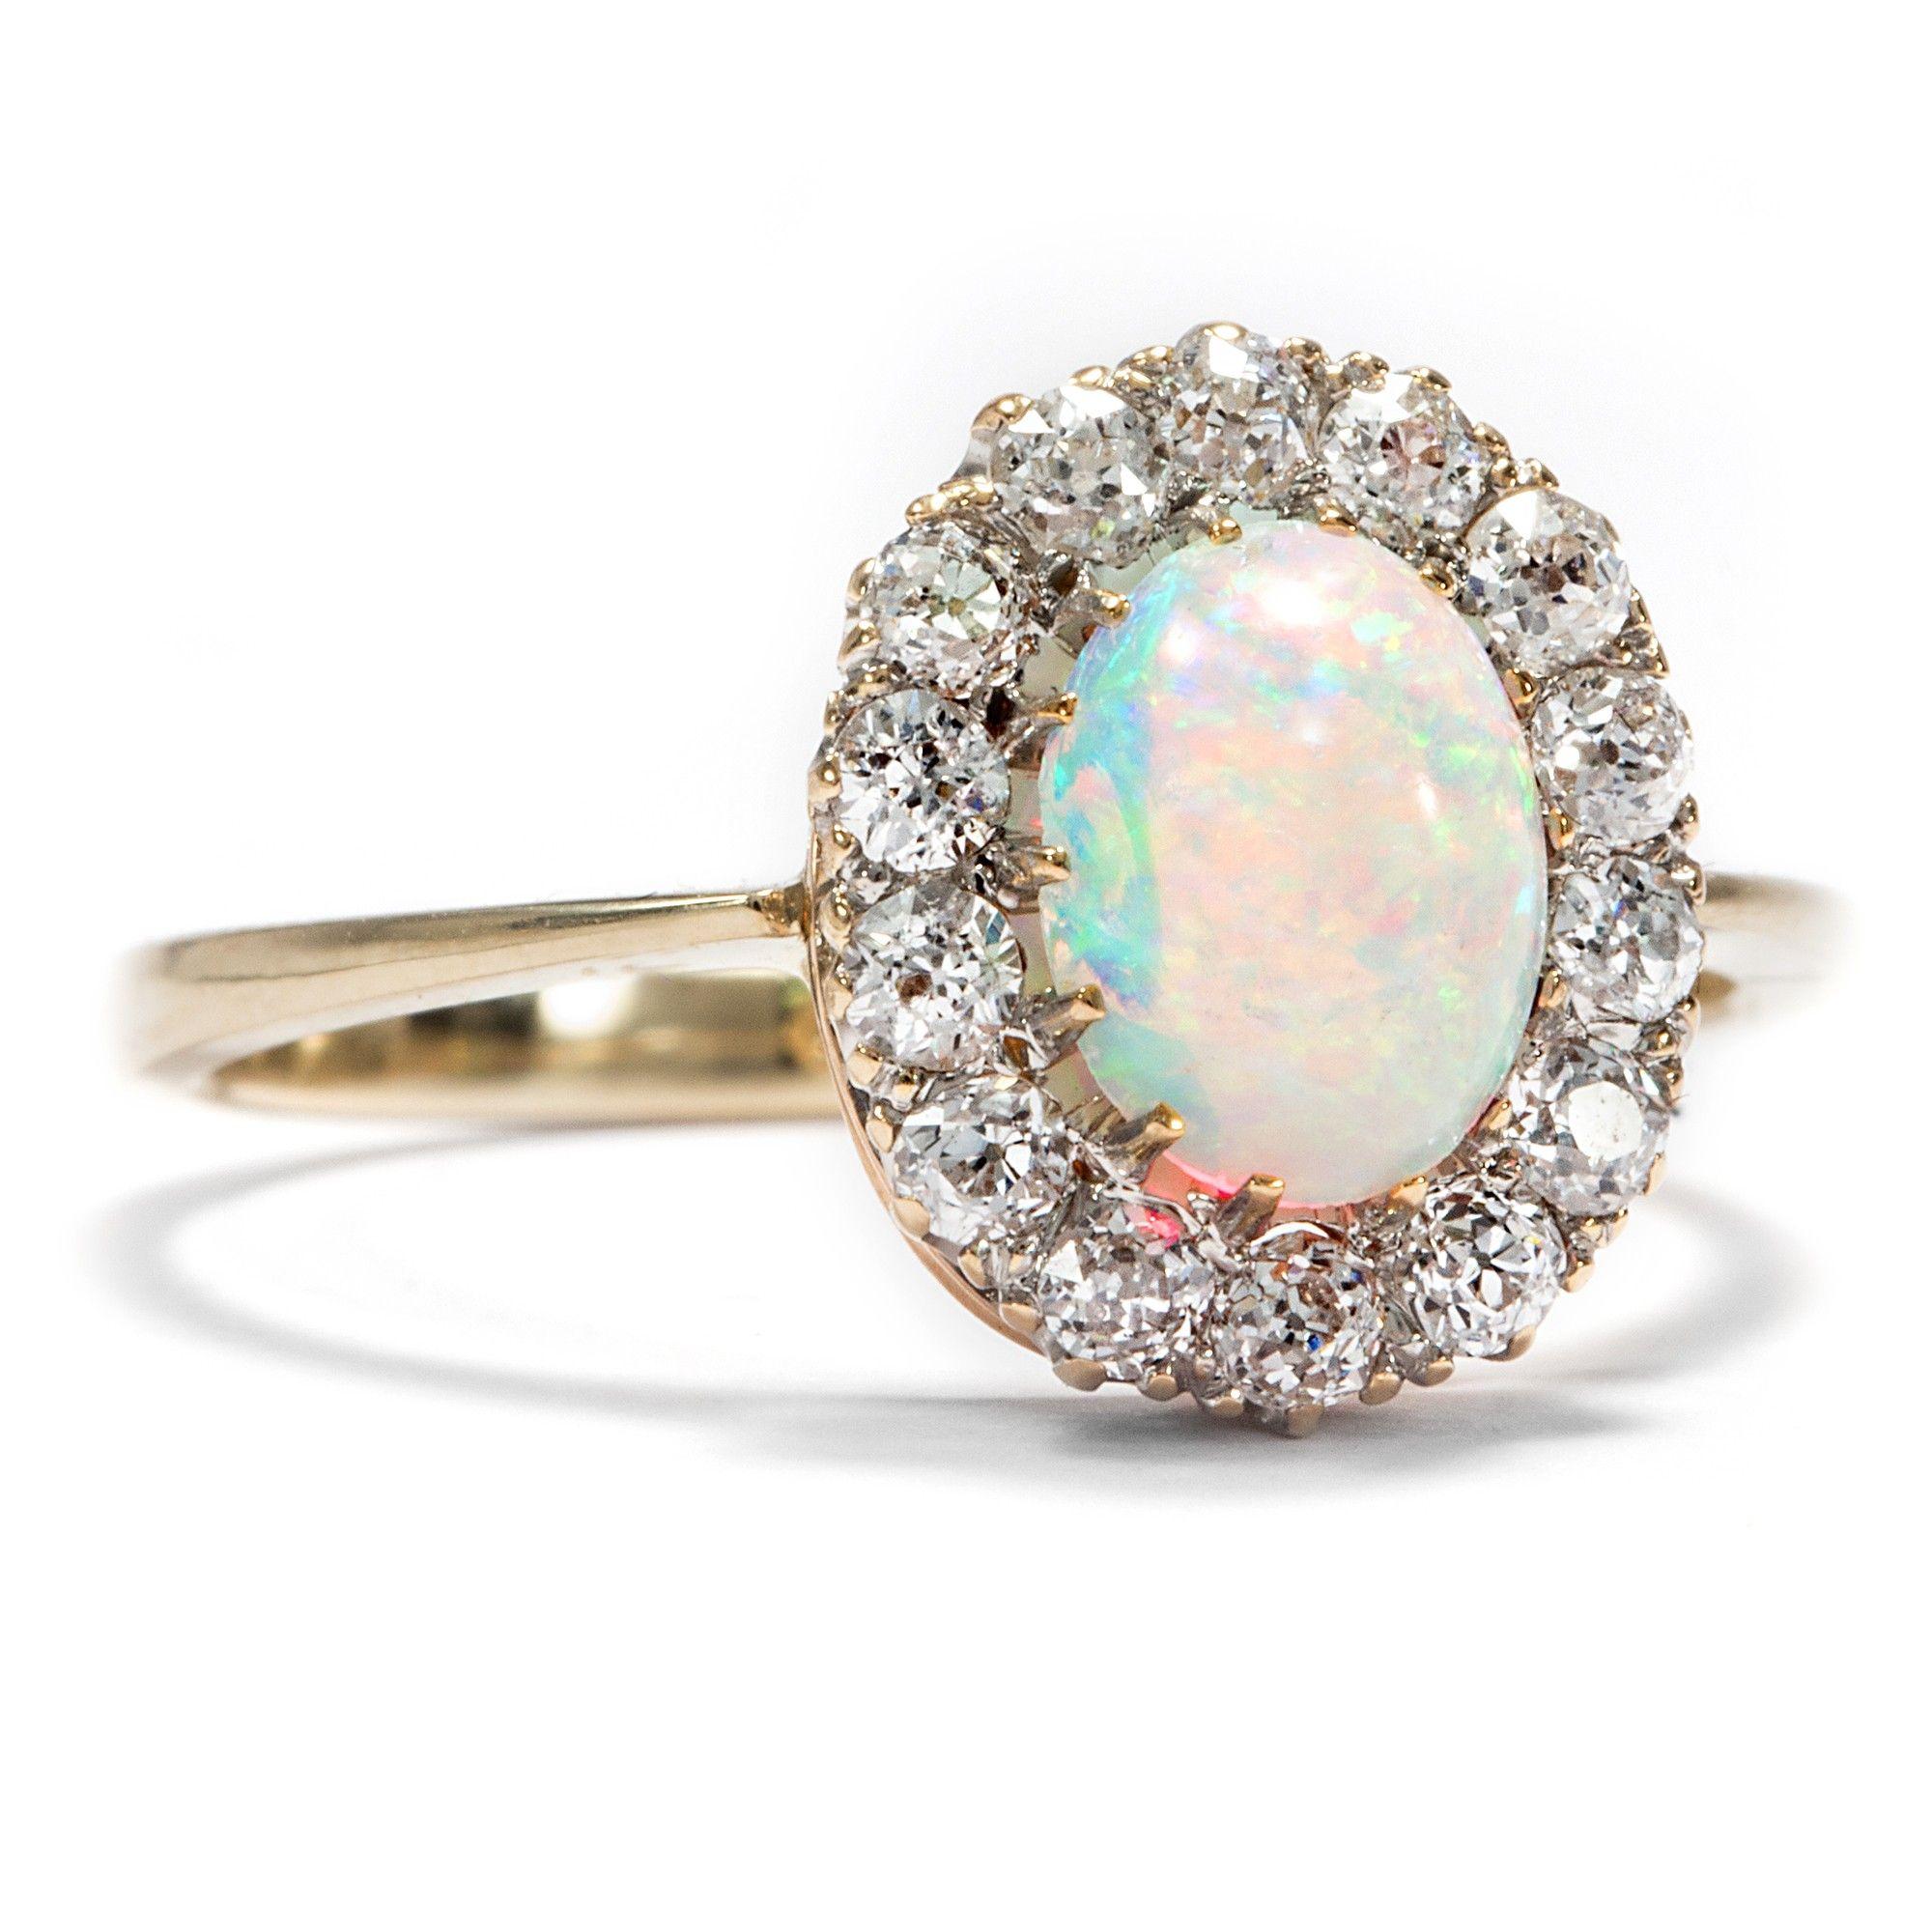 Antiker schmuck  Regenbogenblüte - Antiker Goldring mit exzellentem Opal ...